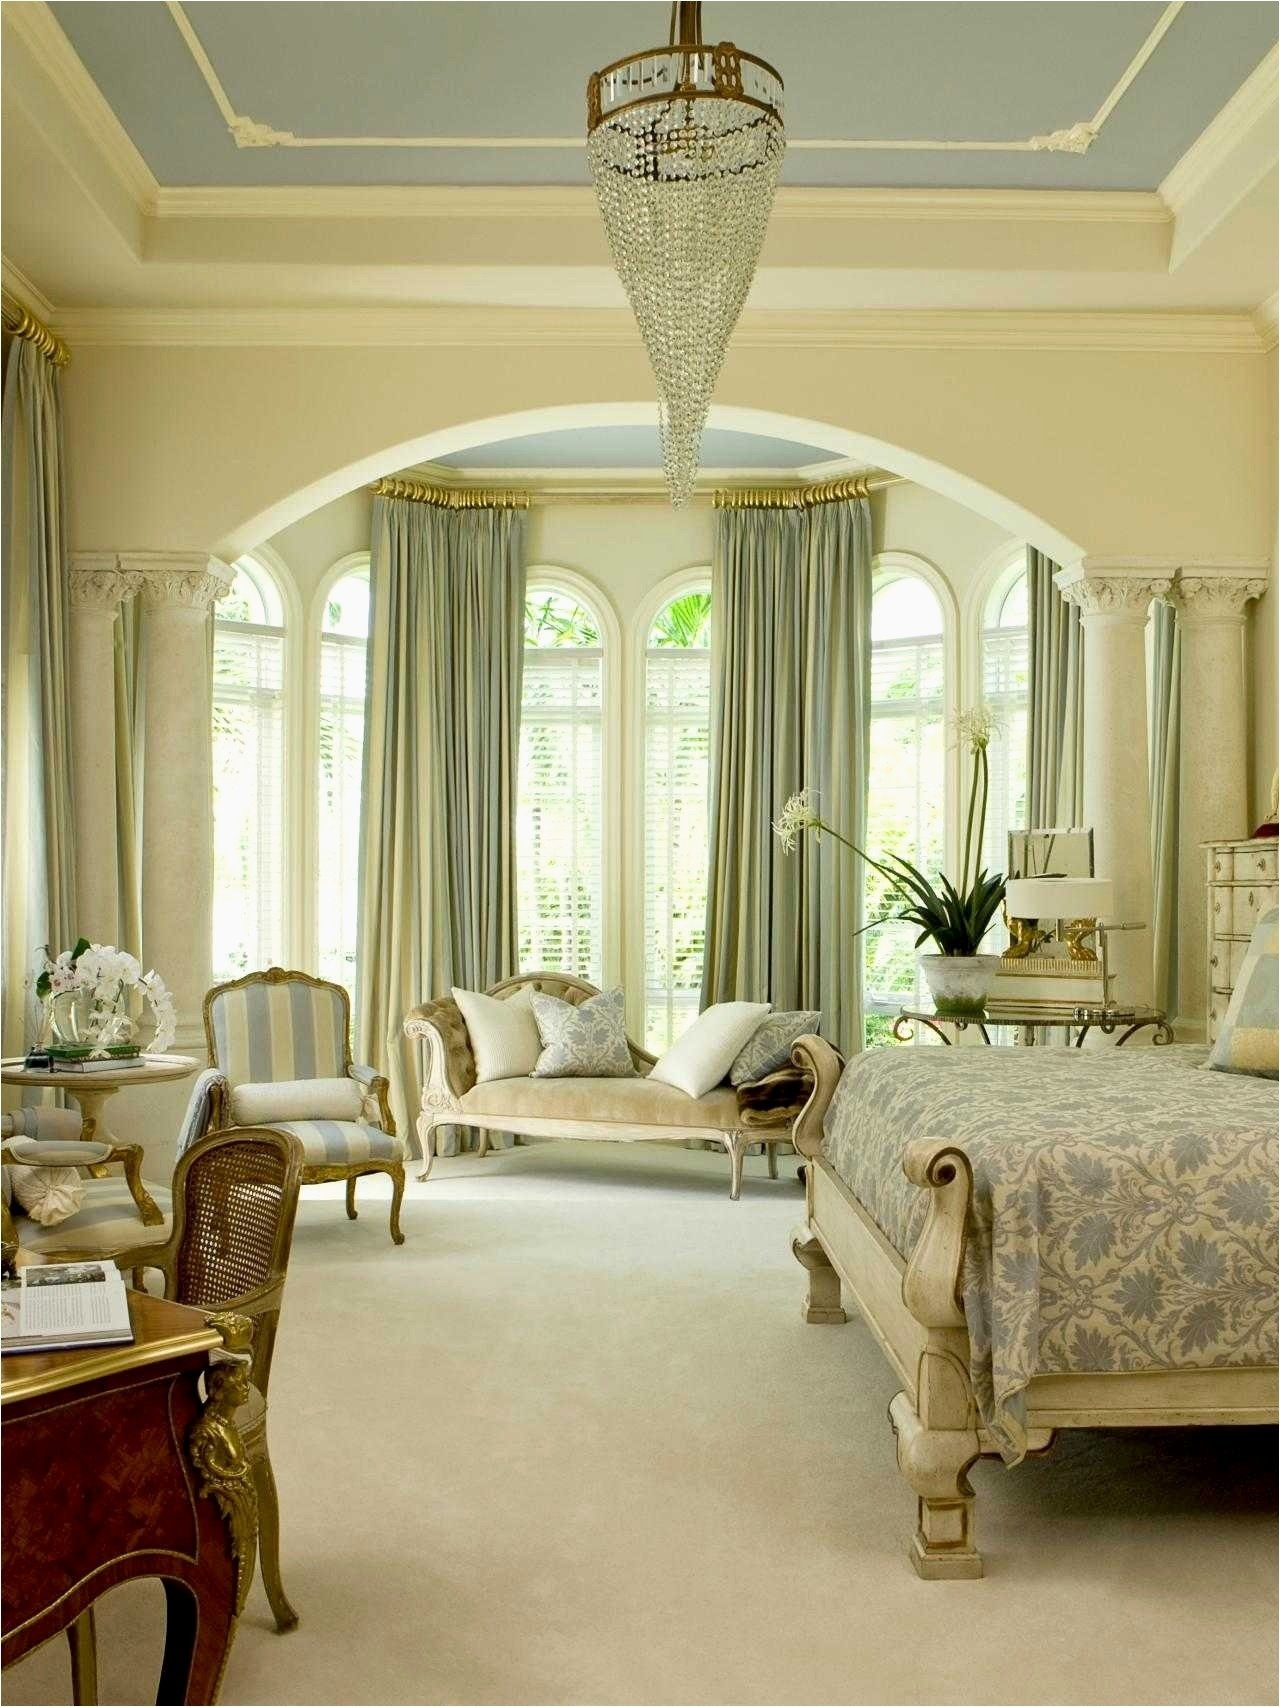 10 Fabulous Master Bedroom Window Treatment Ideas unique window treatment ideas for bedroom idea best bedroom design